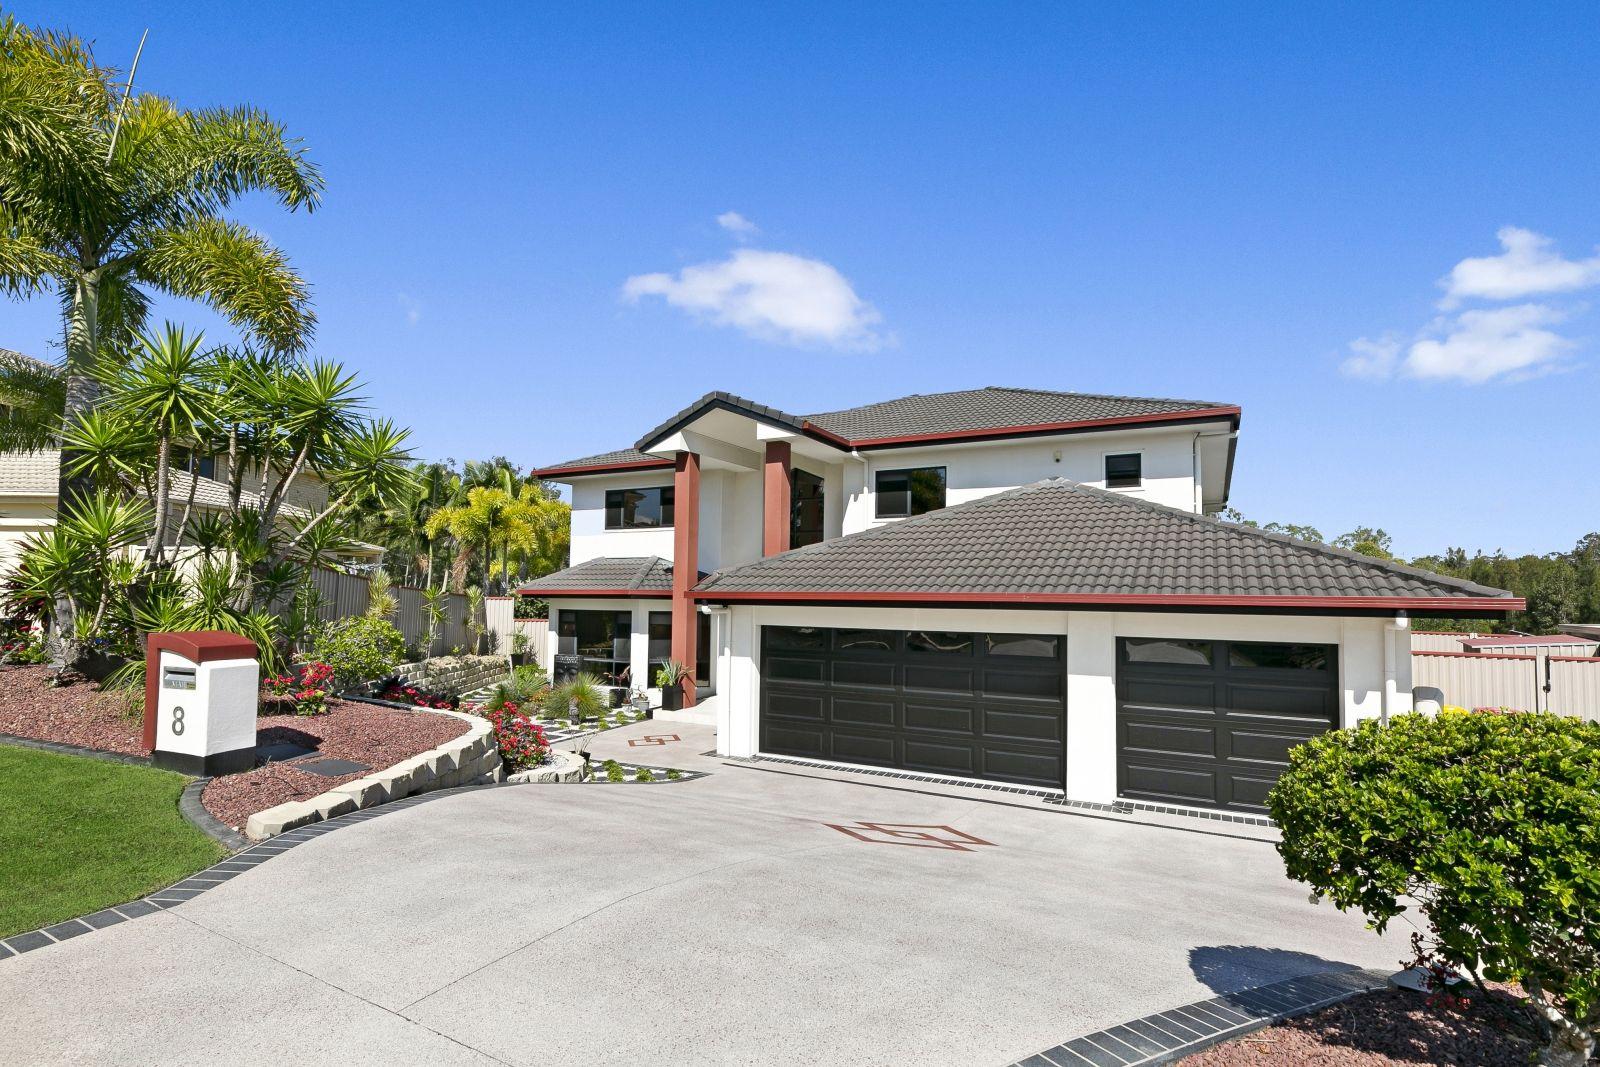 8 Tanzen Drive, Arundel QLD 4214, Image 0